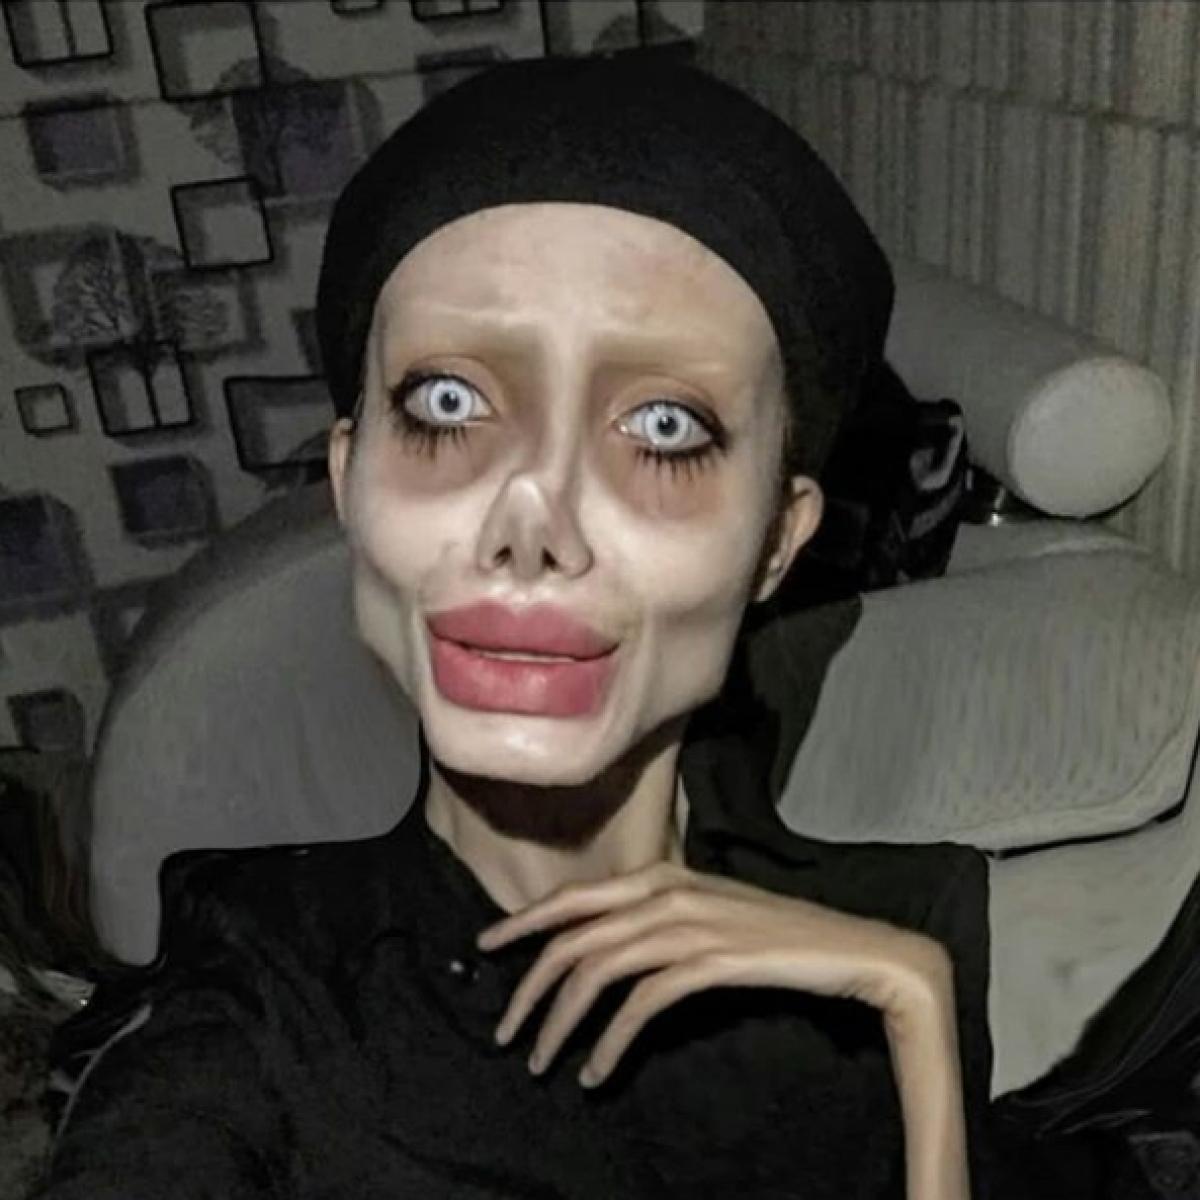 Iran arrests Instagram star for posting Angelina Jolie-lookalike photos